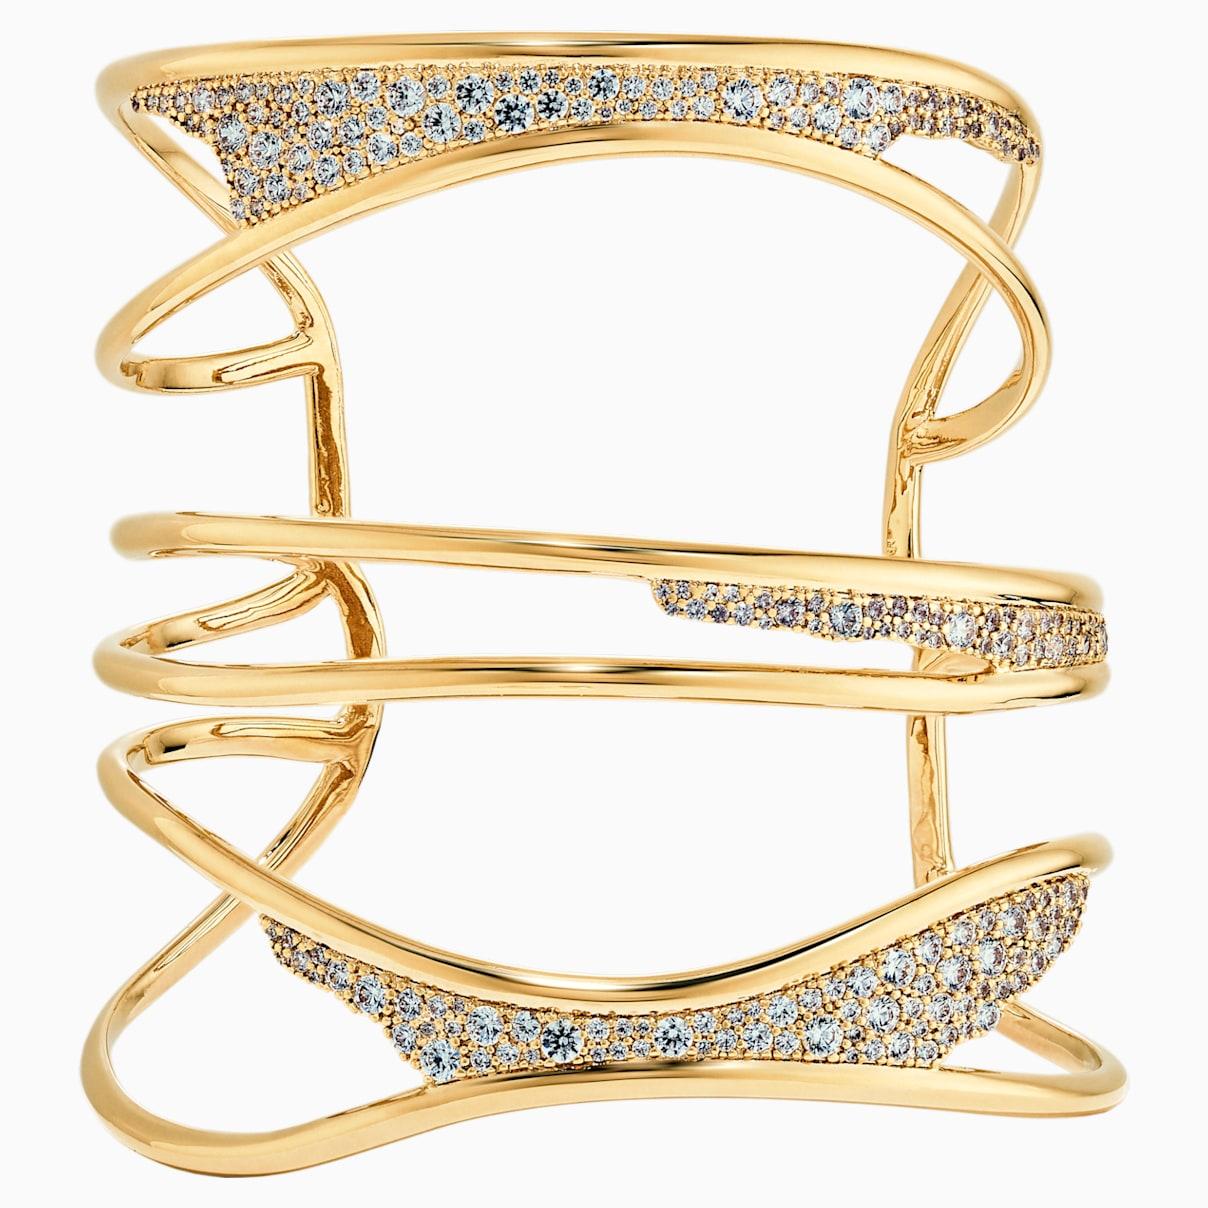 Bracelet-jonc Gilded Treasures, blanc, métal doré